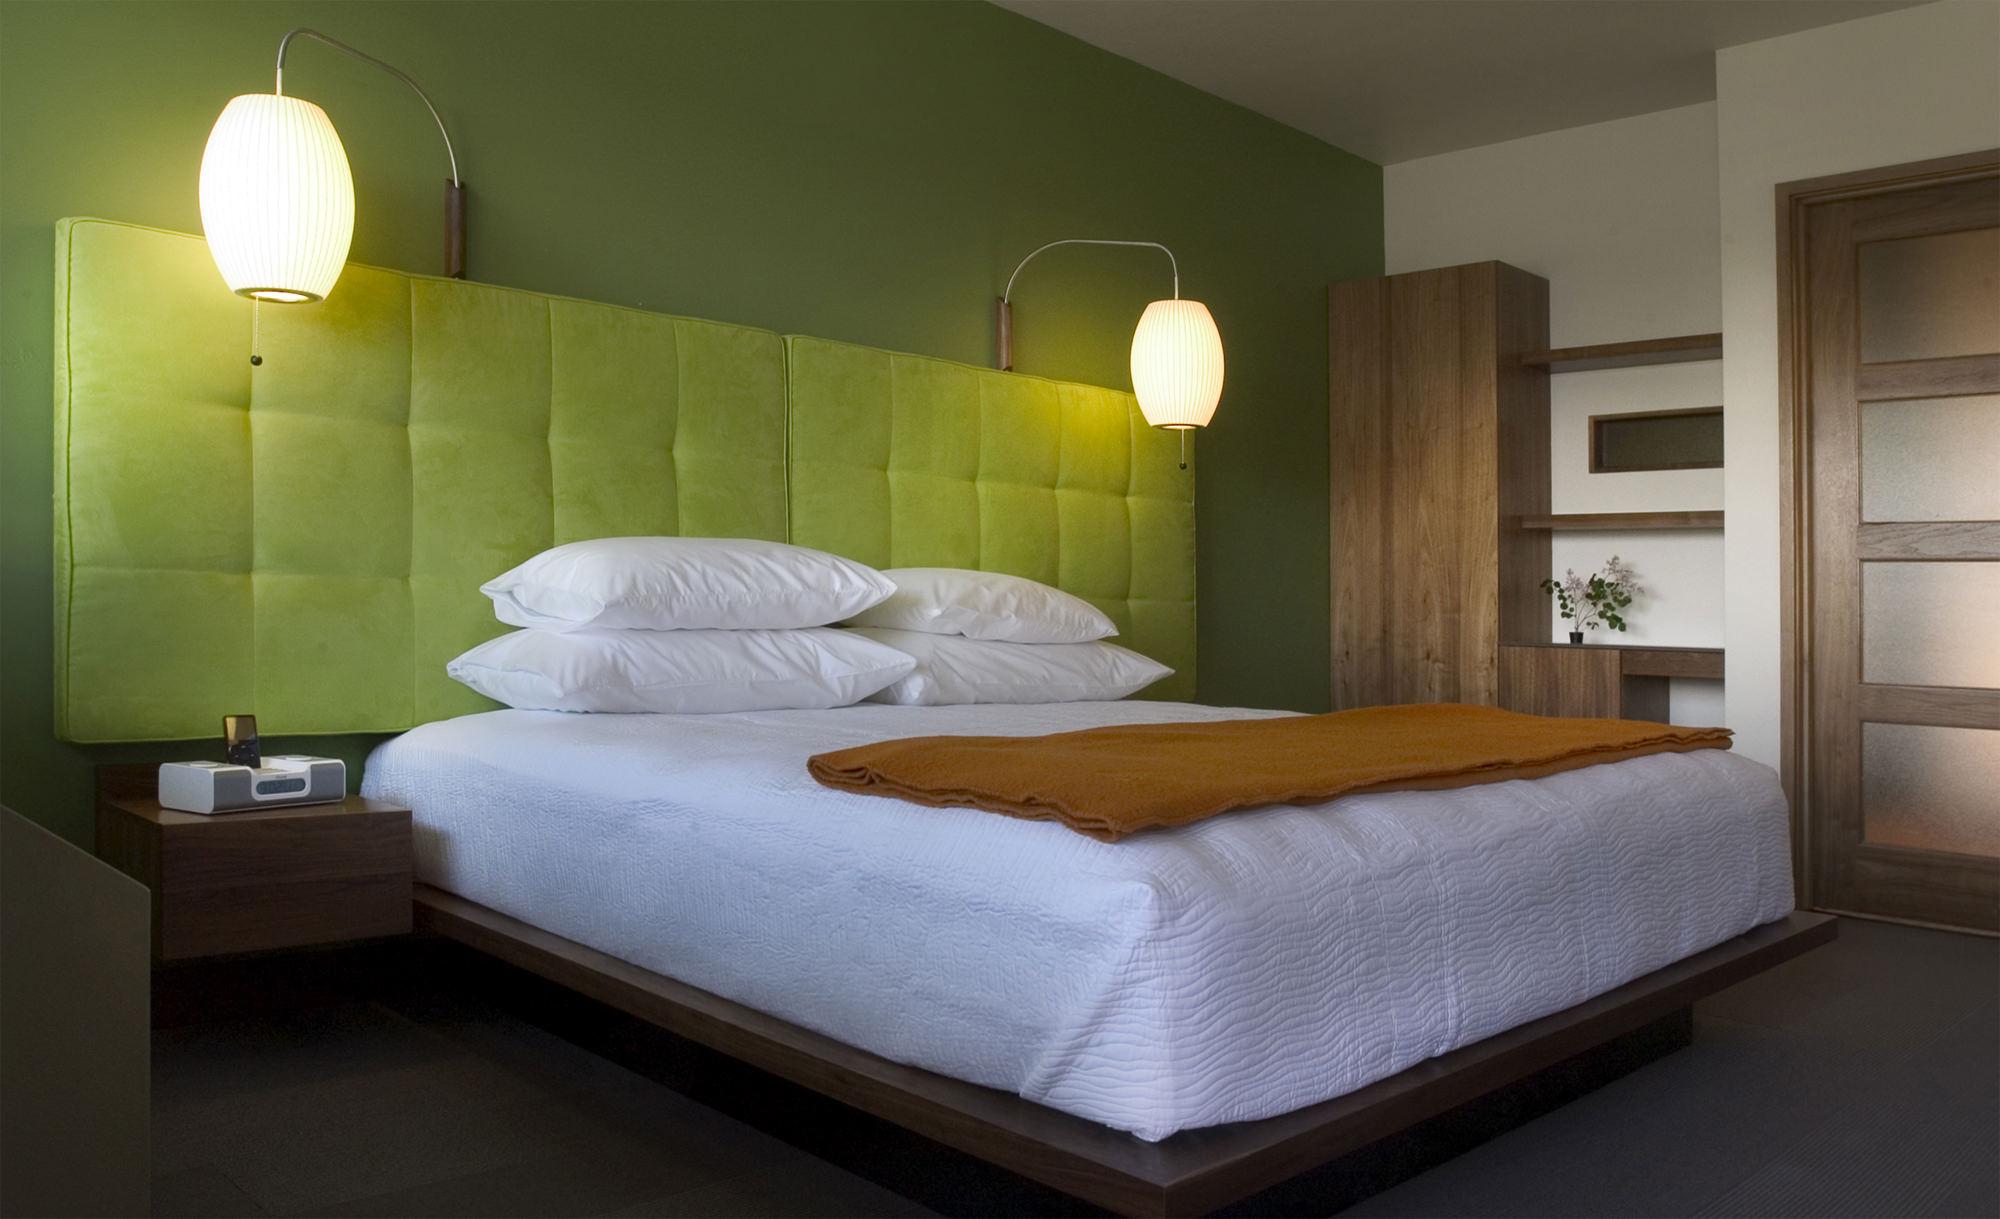 CTY-Studio-Modern-Hotel-bedroom1.jpg